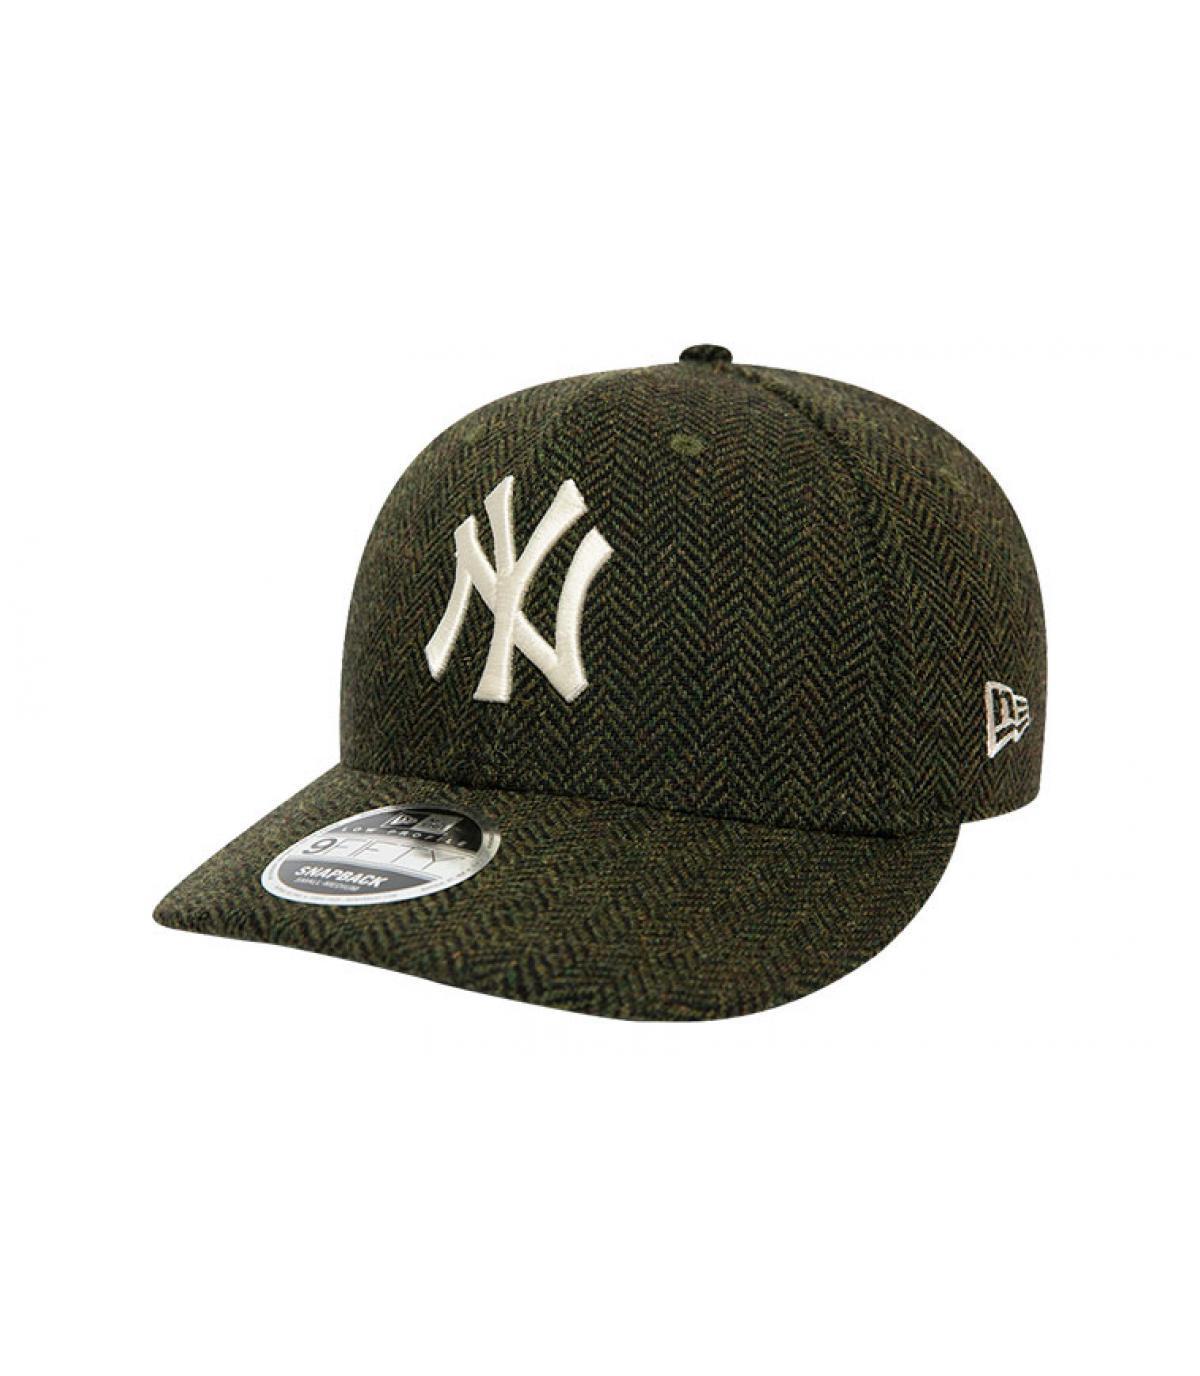 Details Snapback MLB Tweed NY 950 army green - Abbildung 2